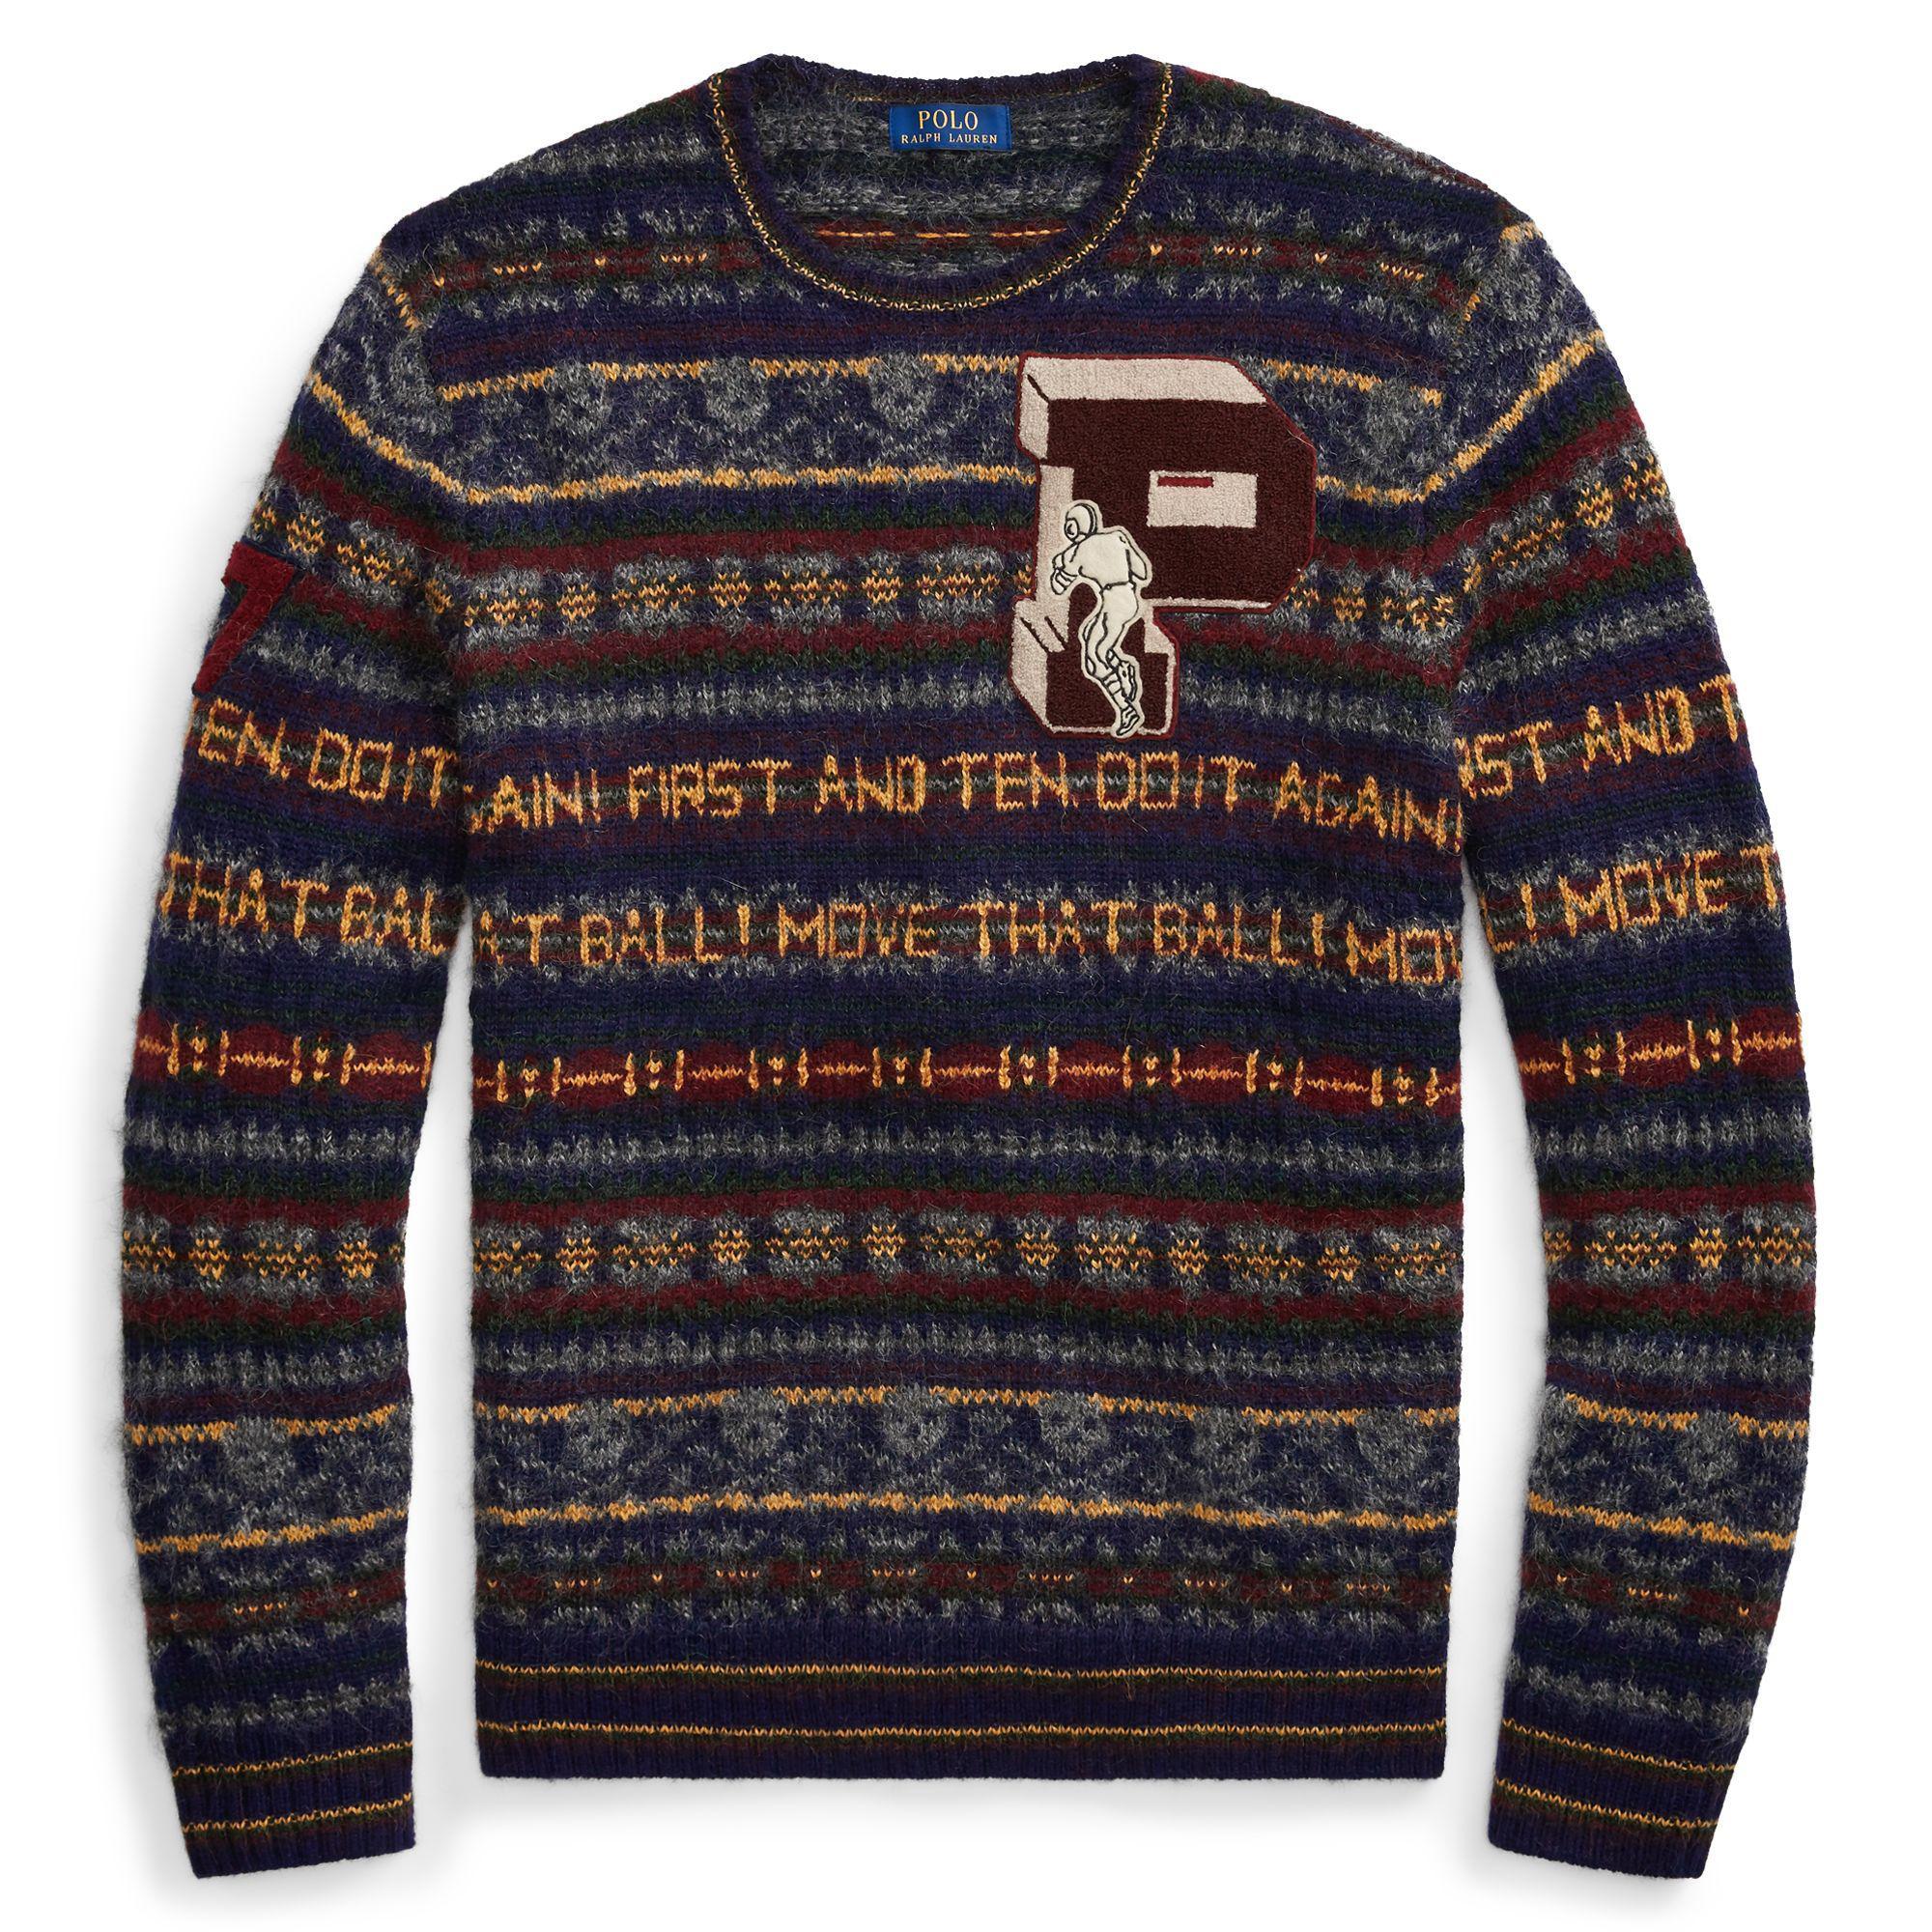 19230b588 ... spain polo ralph lauren blue fair isle wool blend sweater for men lyst.  view fullscreen ...